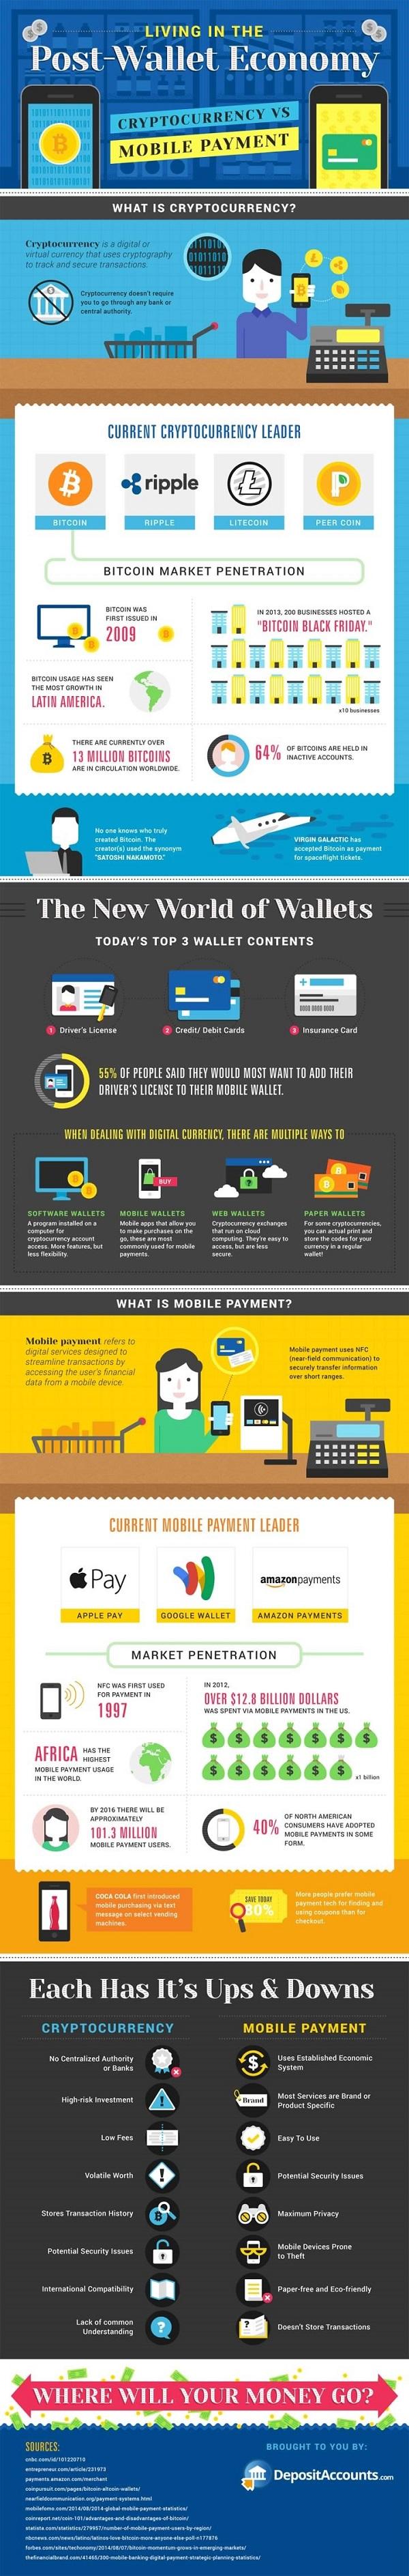 Check Your Virtual Wallet